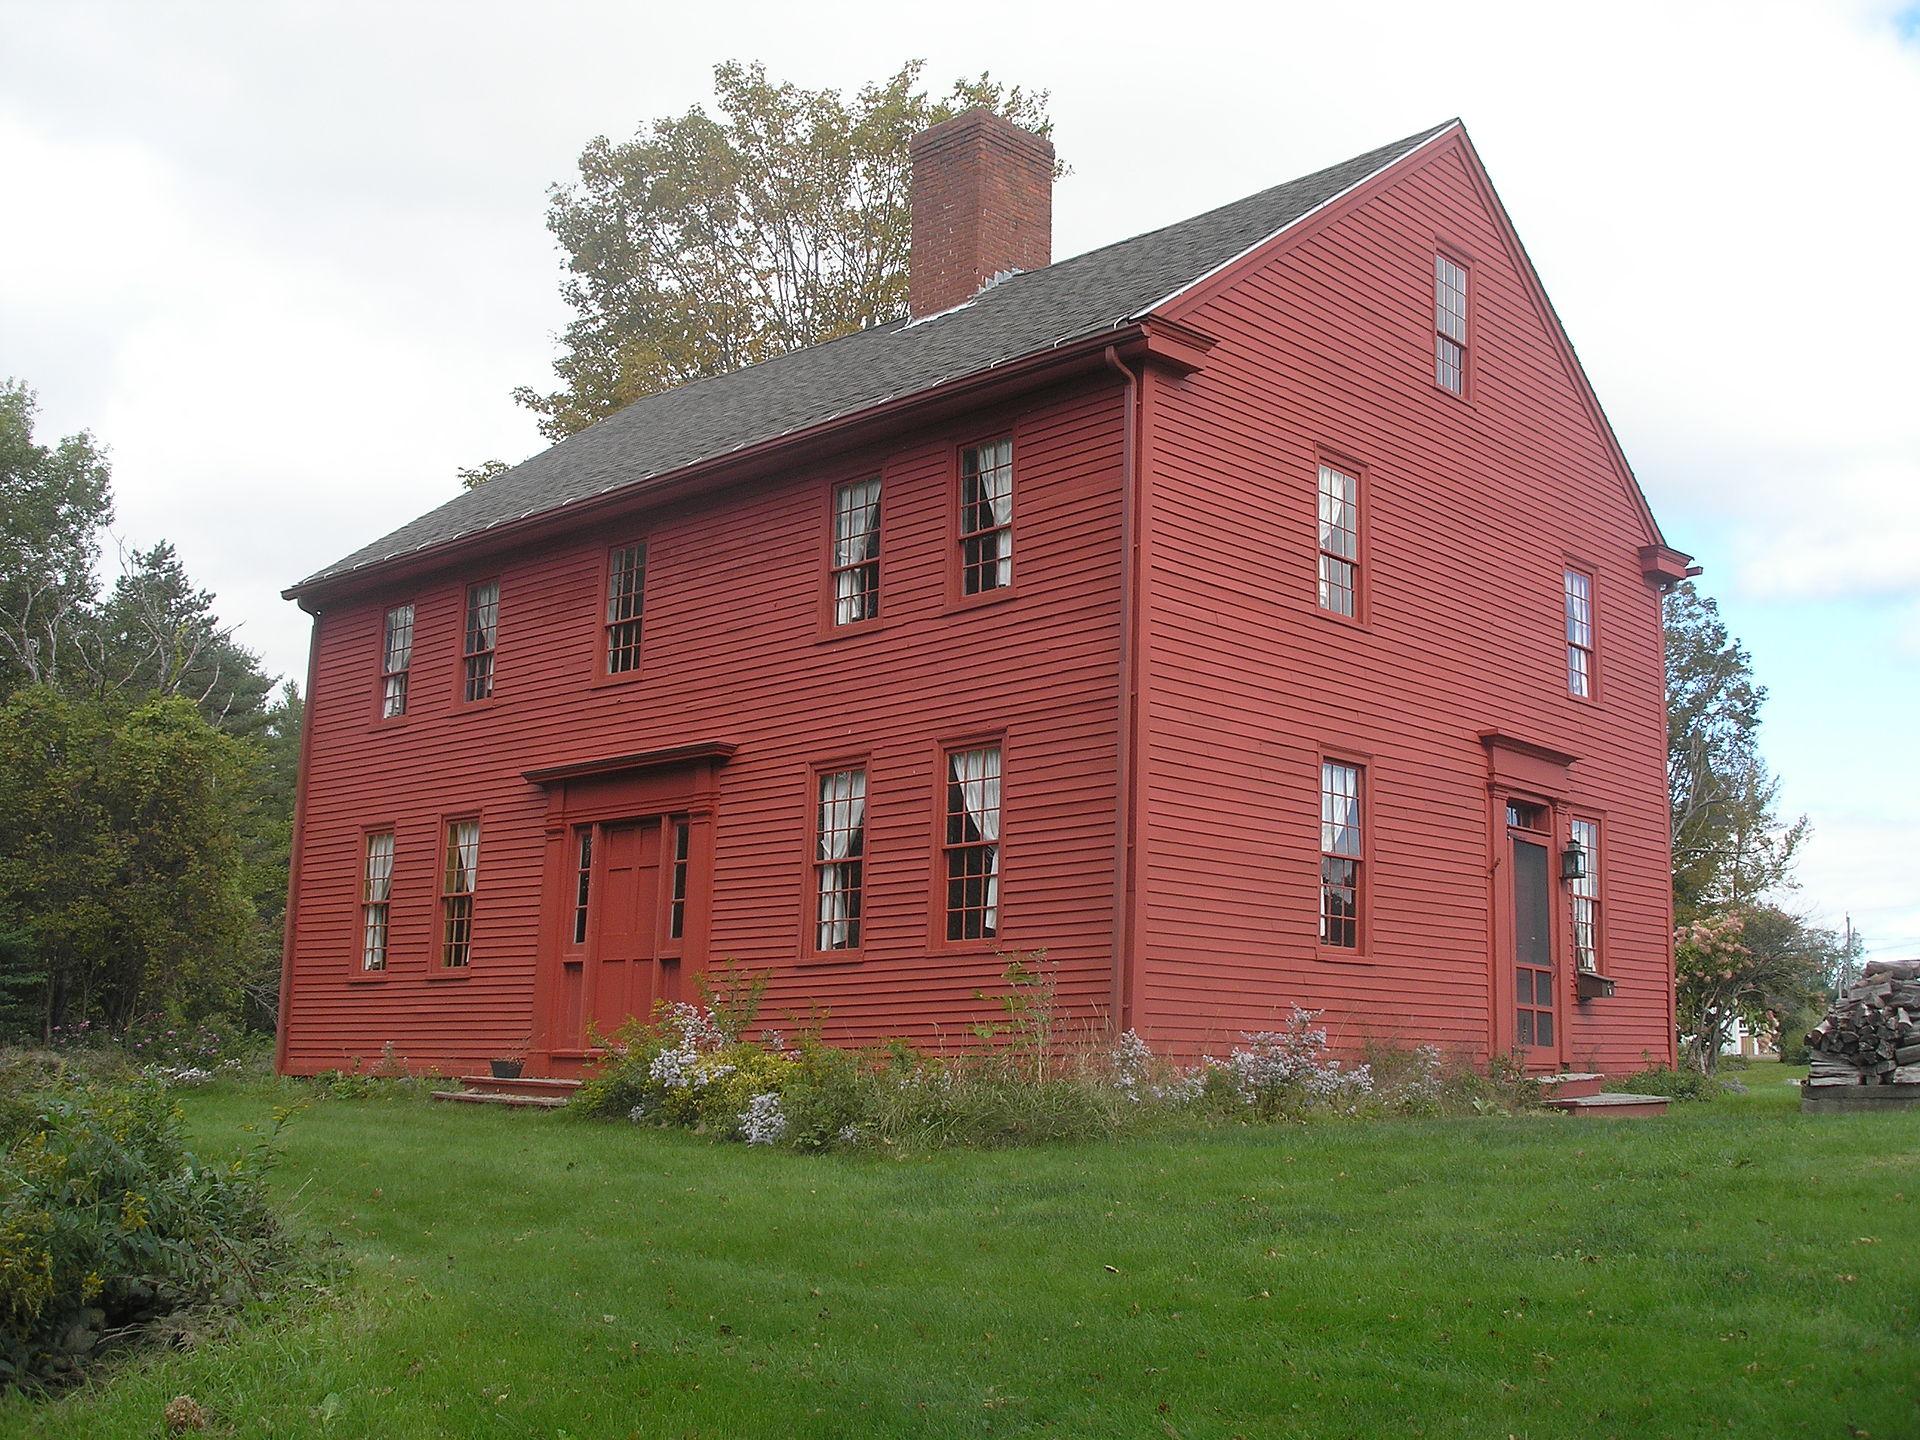 The Colburn House